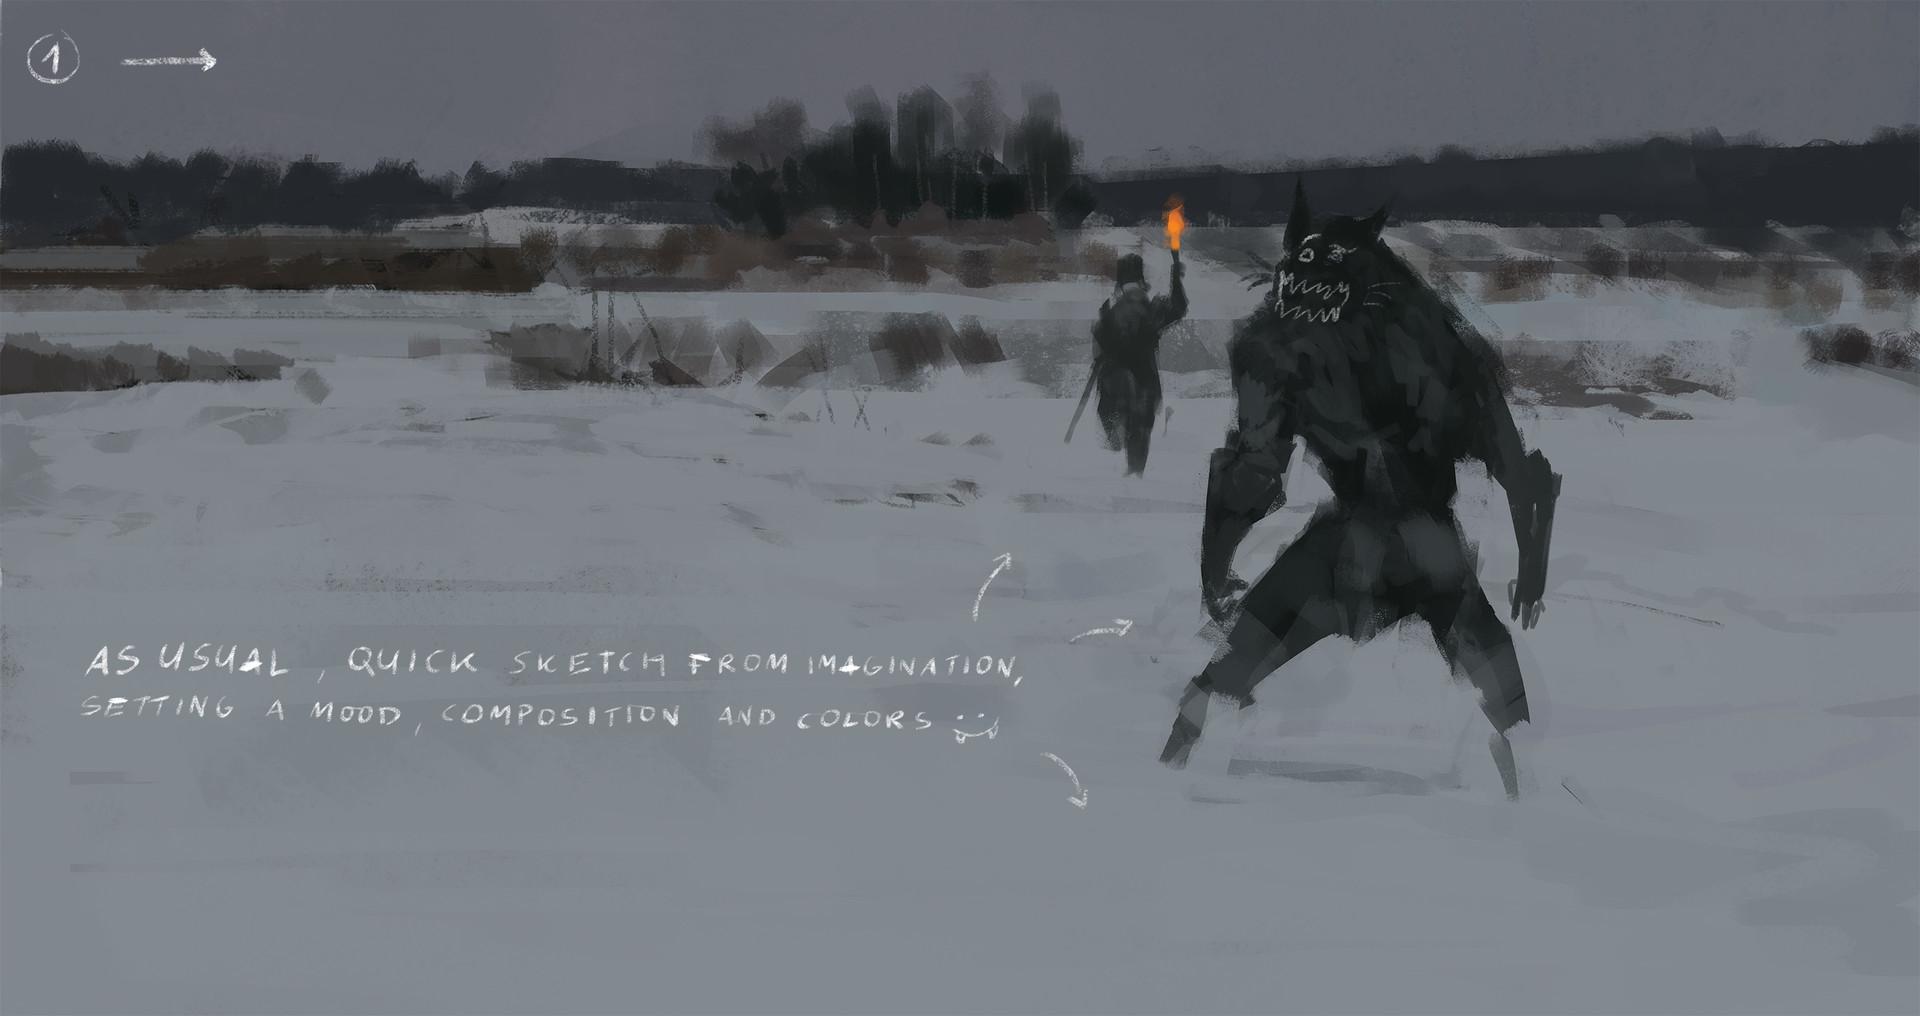 Jakub rozalski wolfpack hunt01 14112016 process01